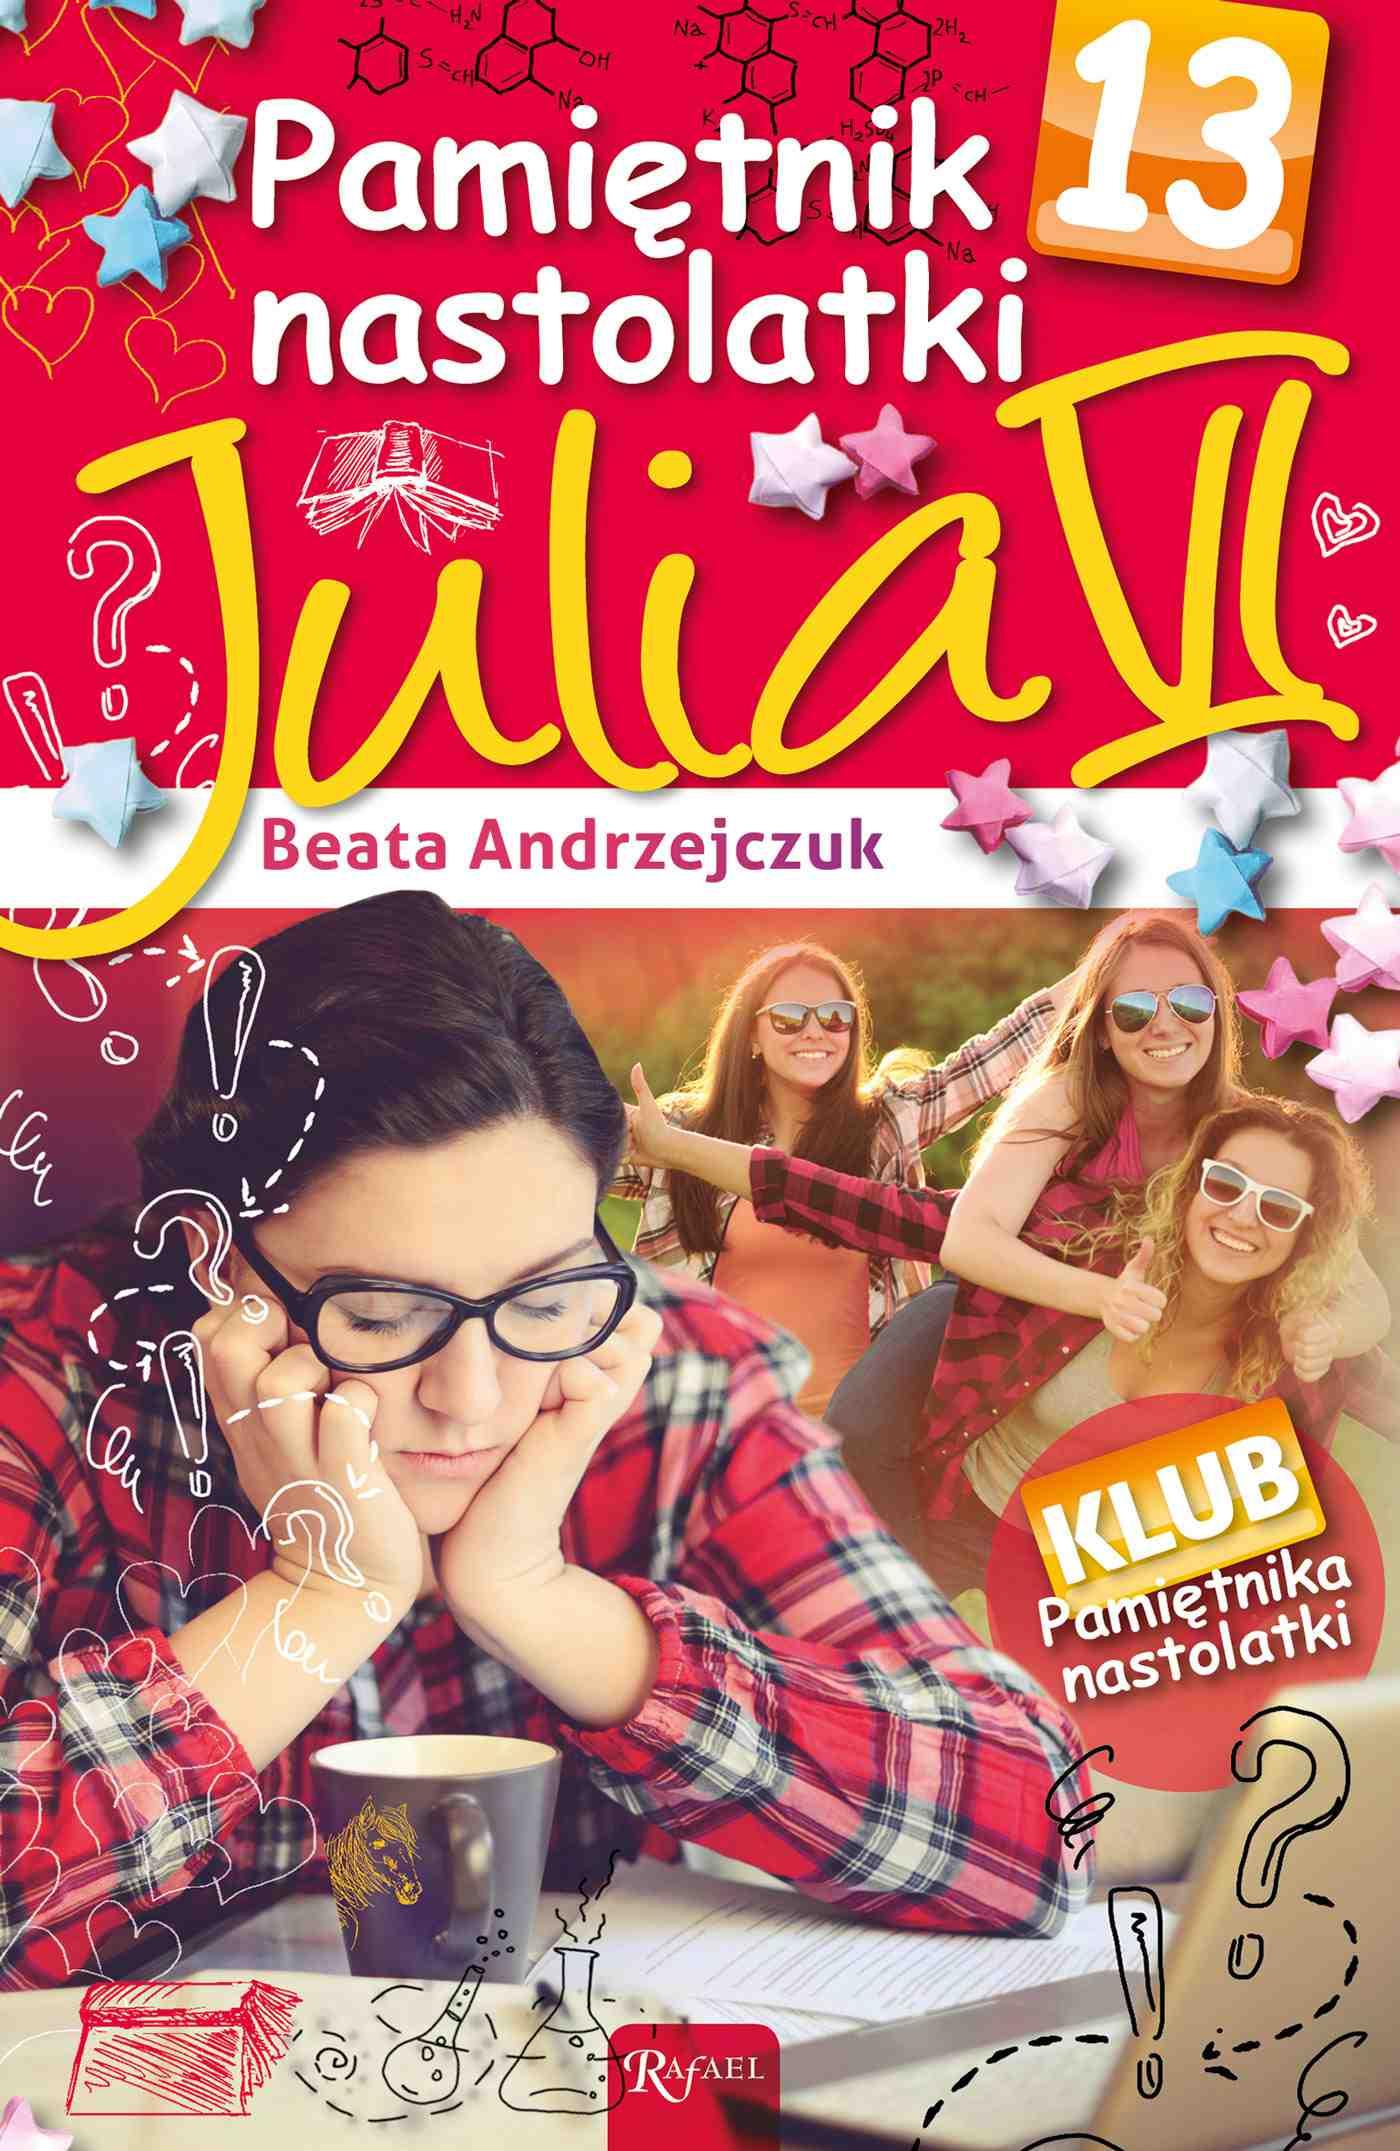 Pamiętnik nastolatki 13. Julia VI - Ebook (Książka EPUB) do pobrania w formacie EPUB